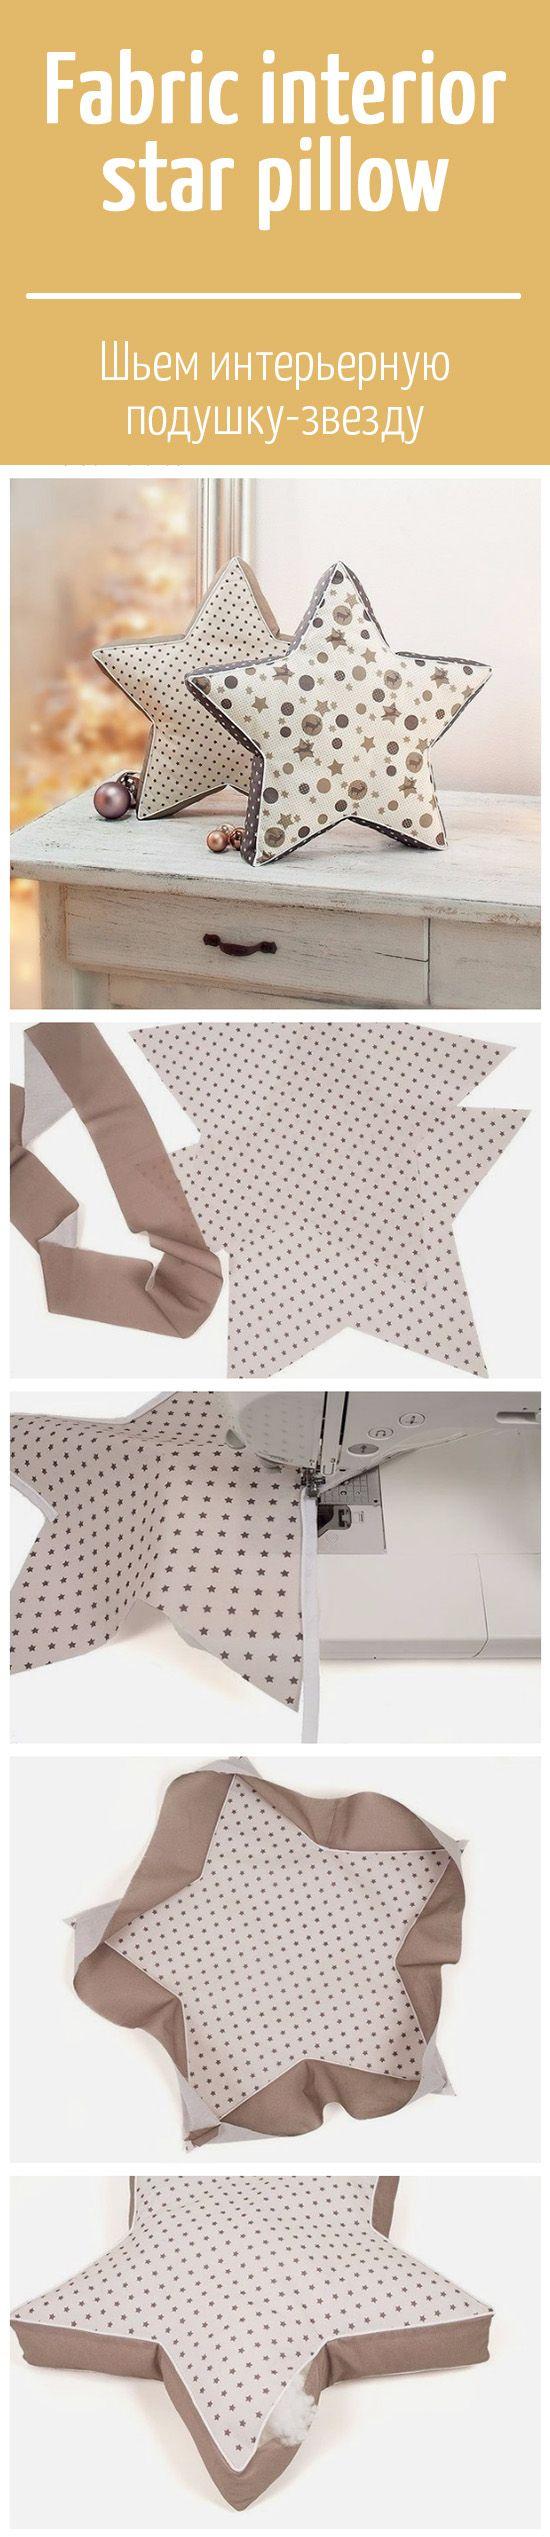 Fabric interior star pillow / Шьем своими руками интерьерную подушку-звезду